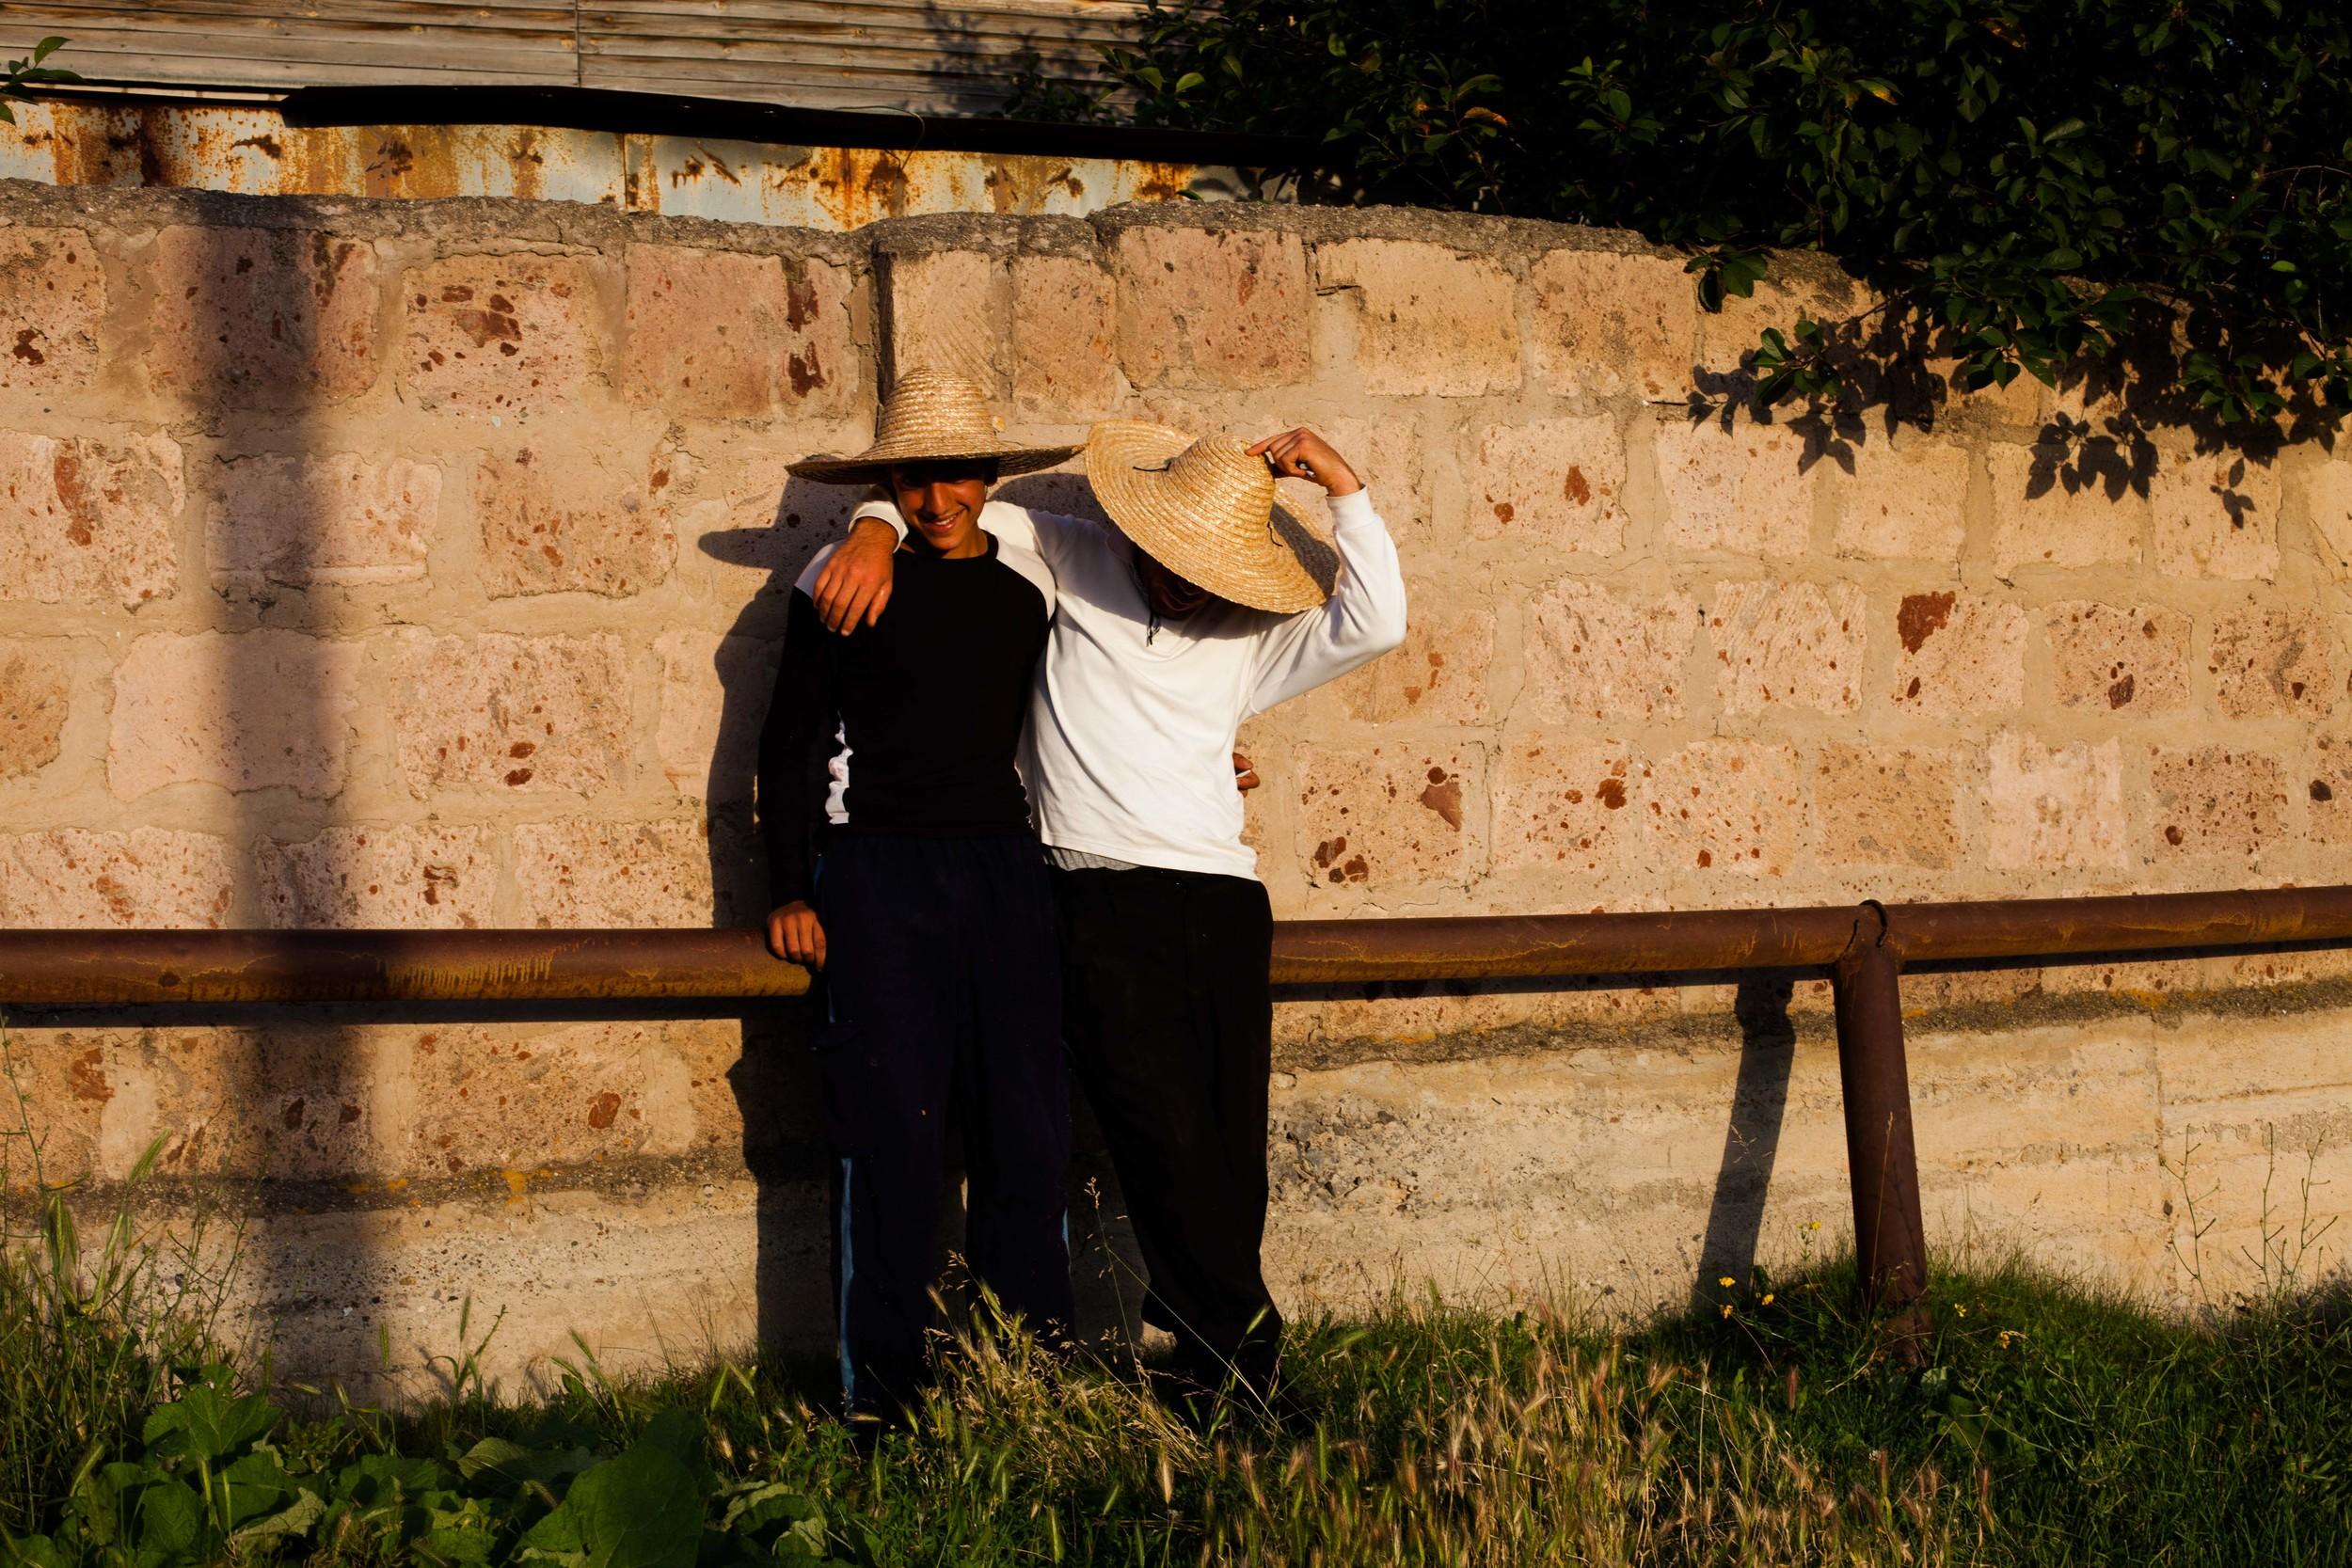 Spitak residents soak in the evening sun.